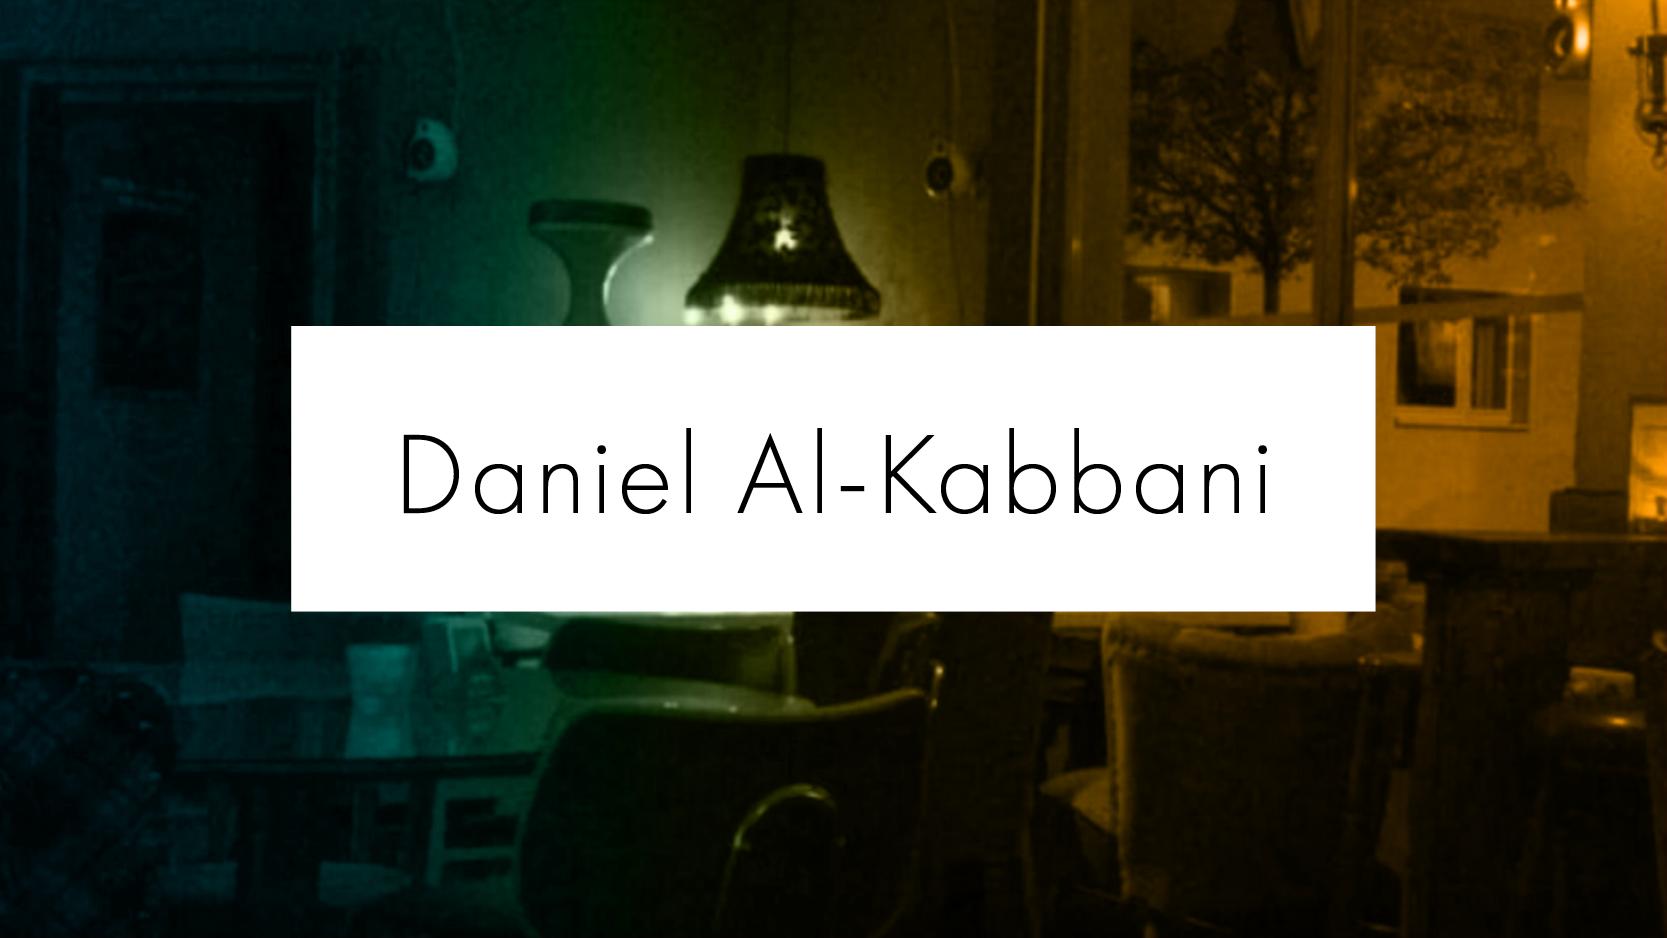 Daniel Al-Kabbani